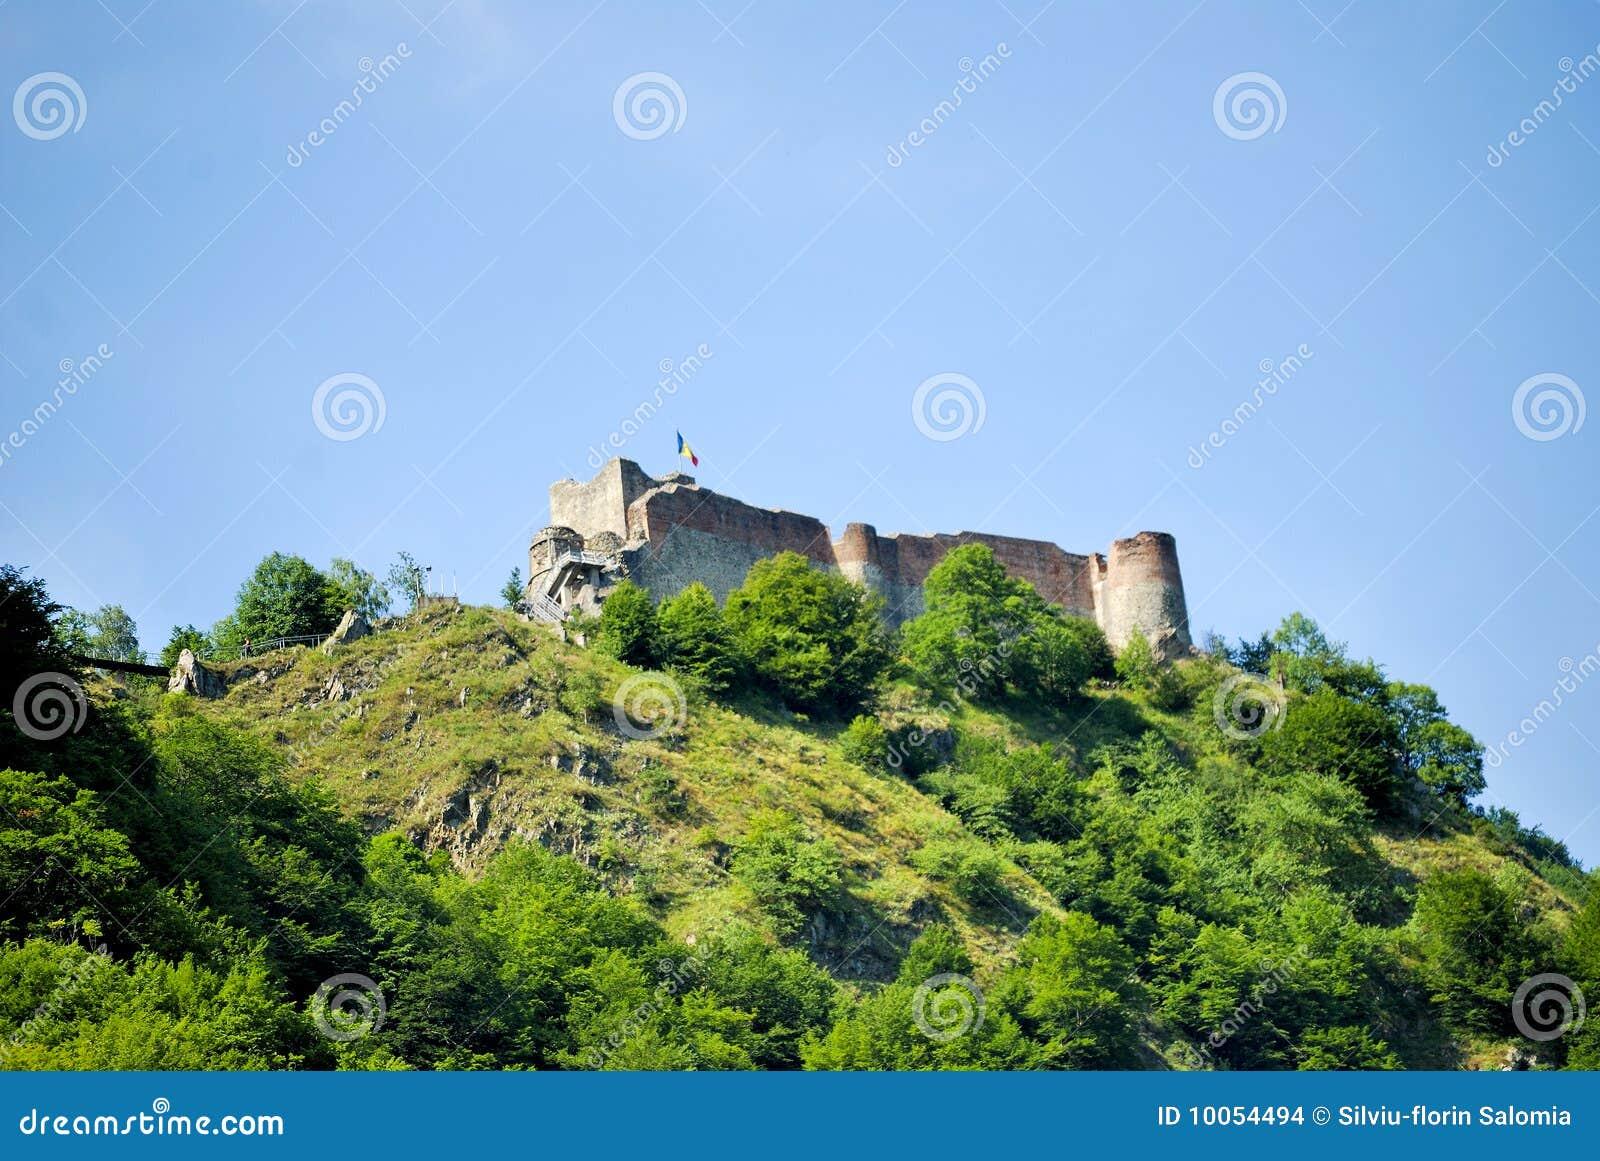 Fortaleza da montanha alta